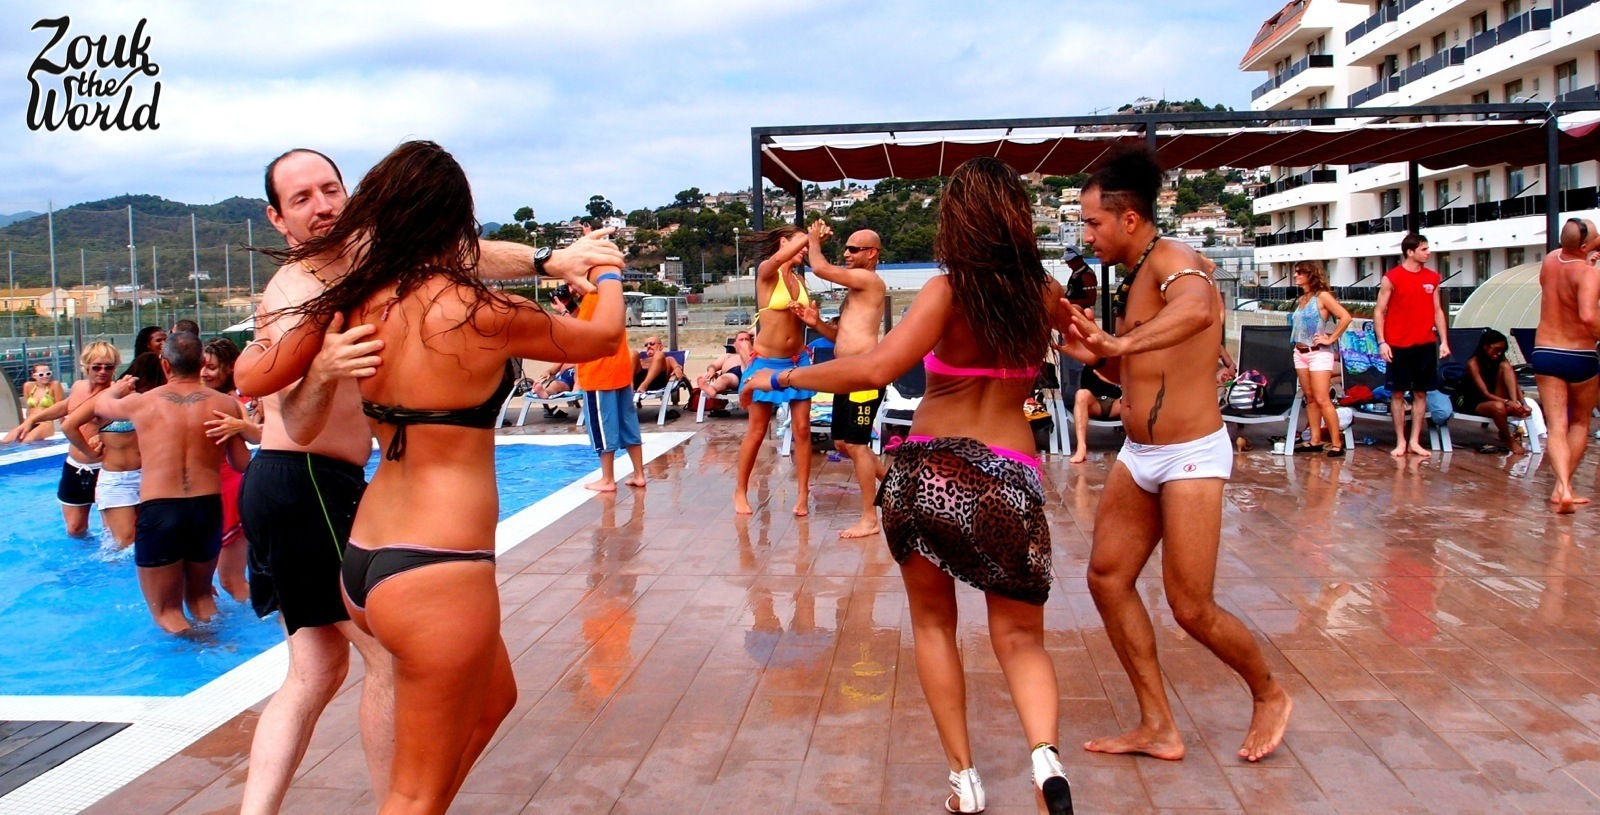 Pool party at Zouk-Lambada beach festival in santa susana